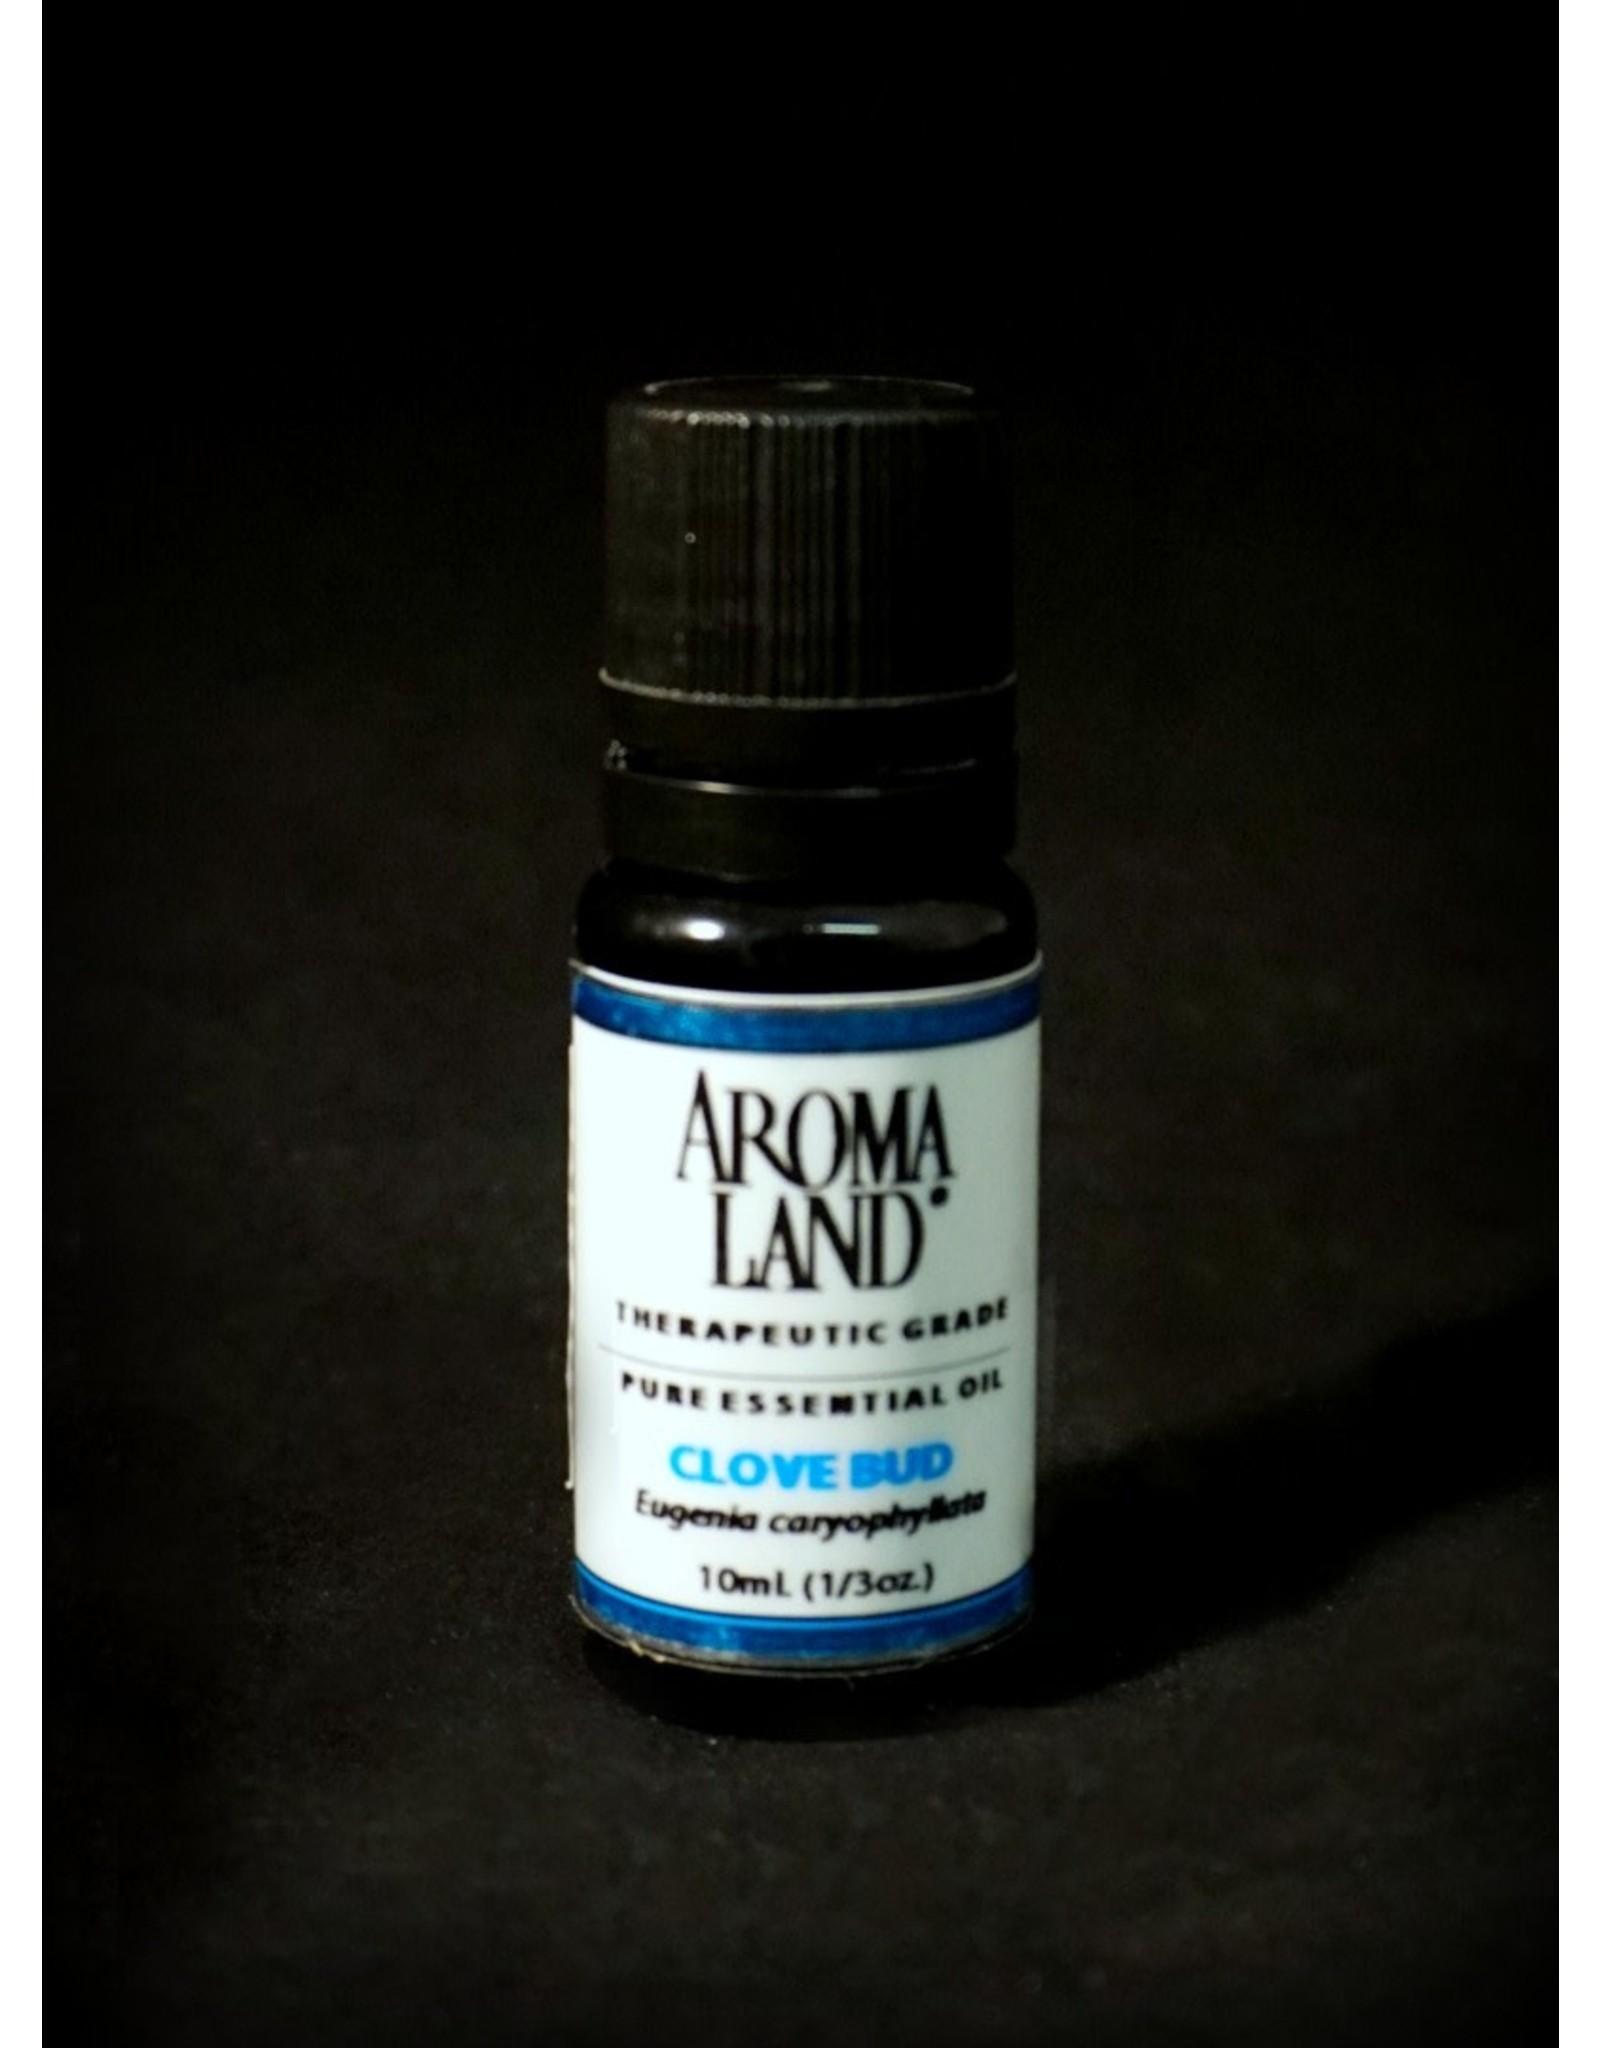 Aromaland Essential Oil - Clove Bud